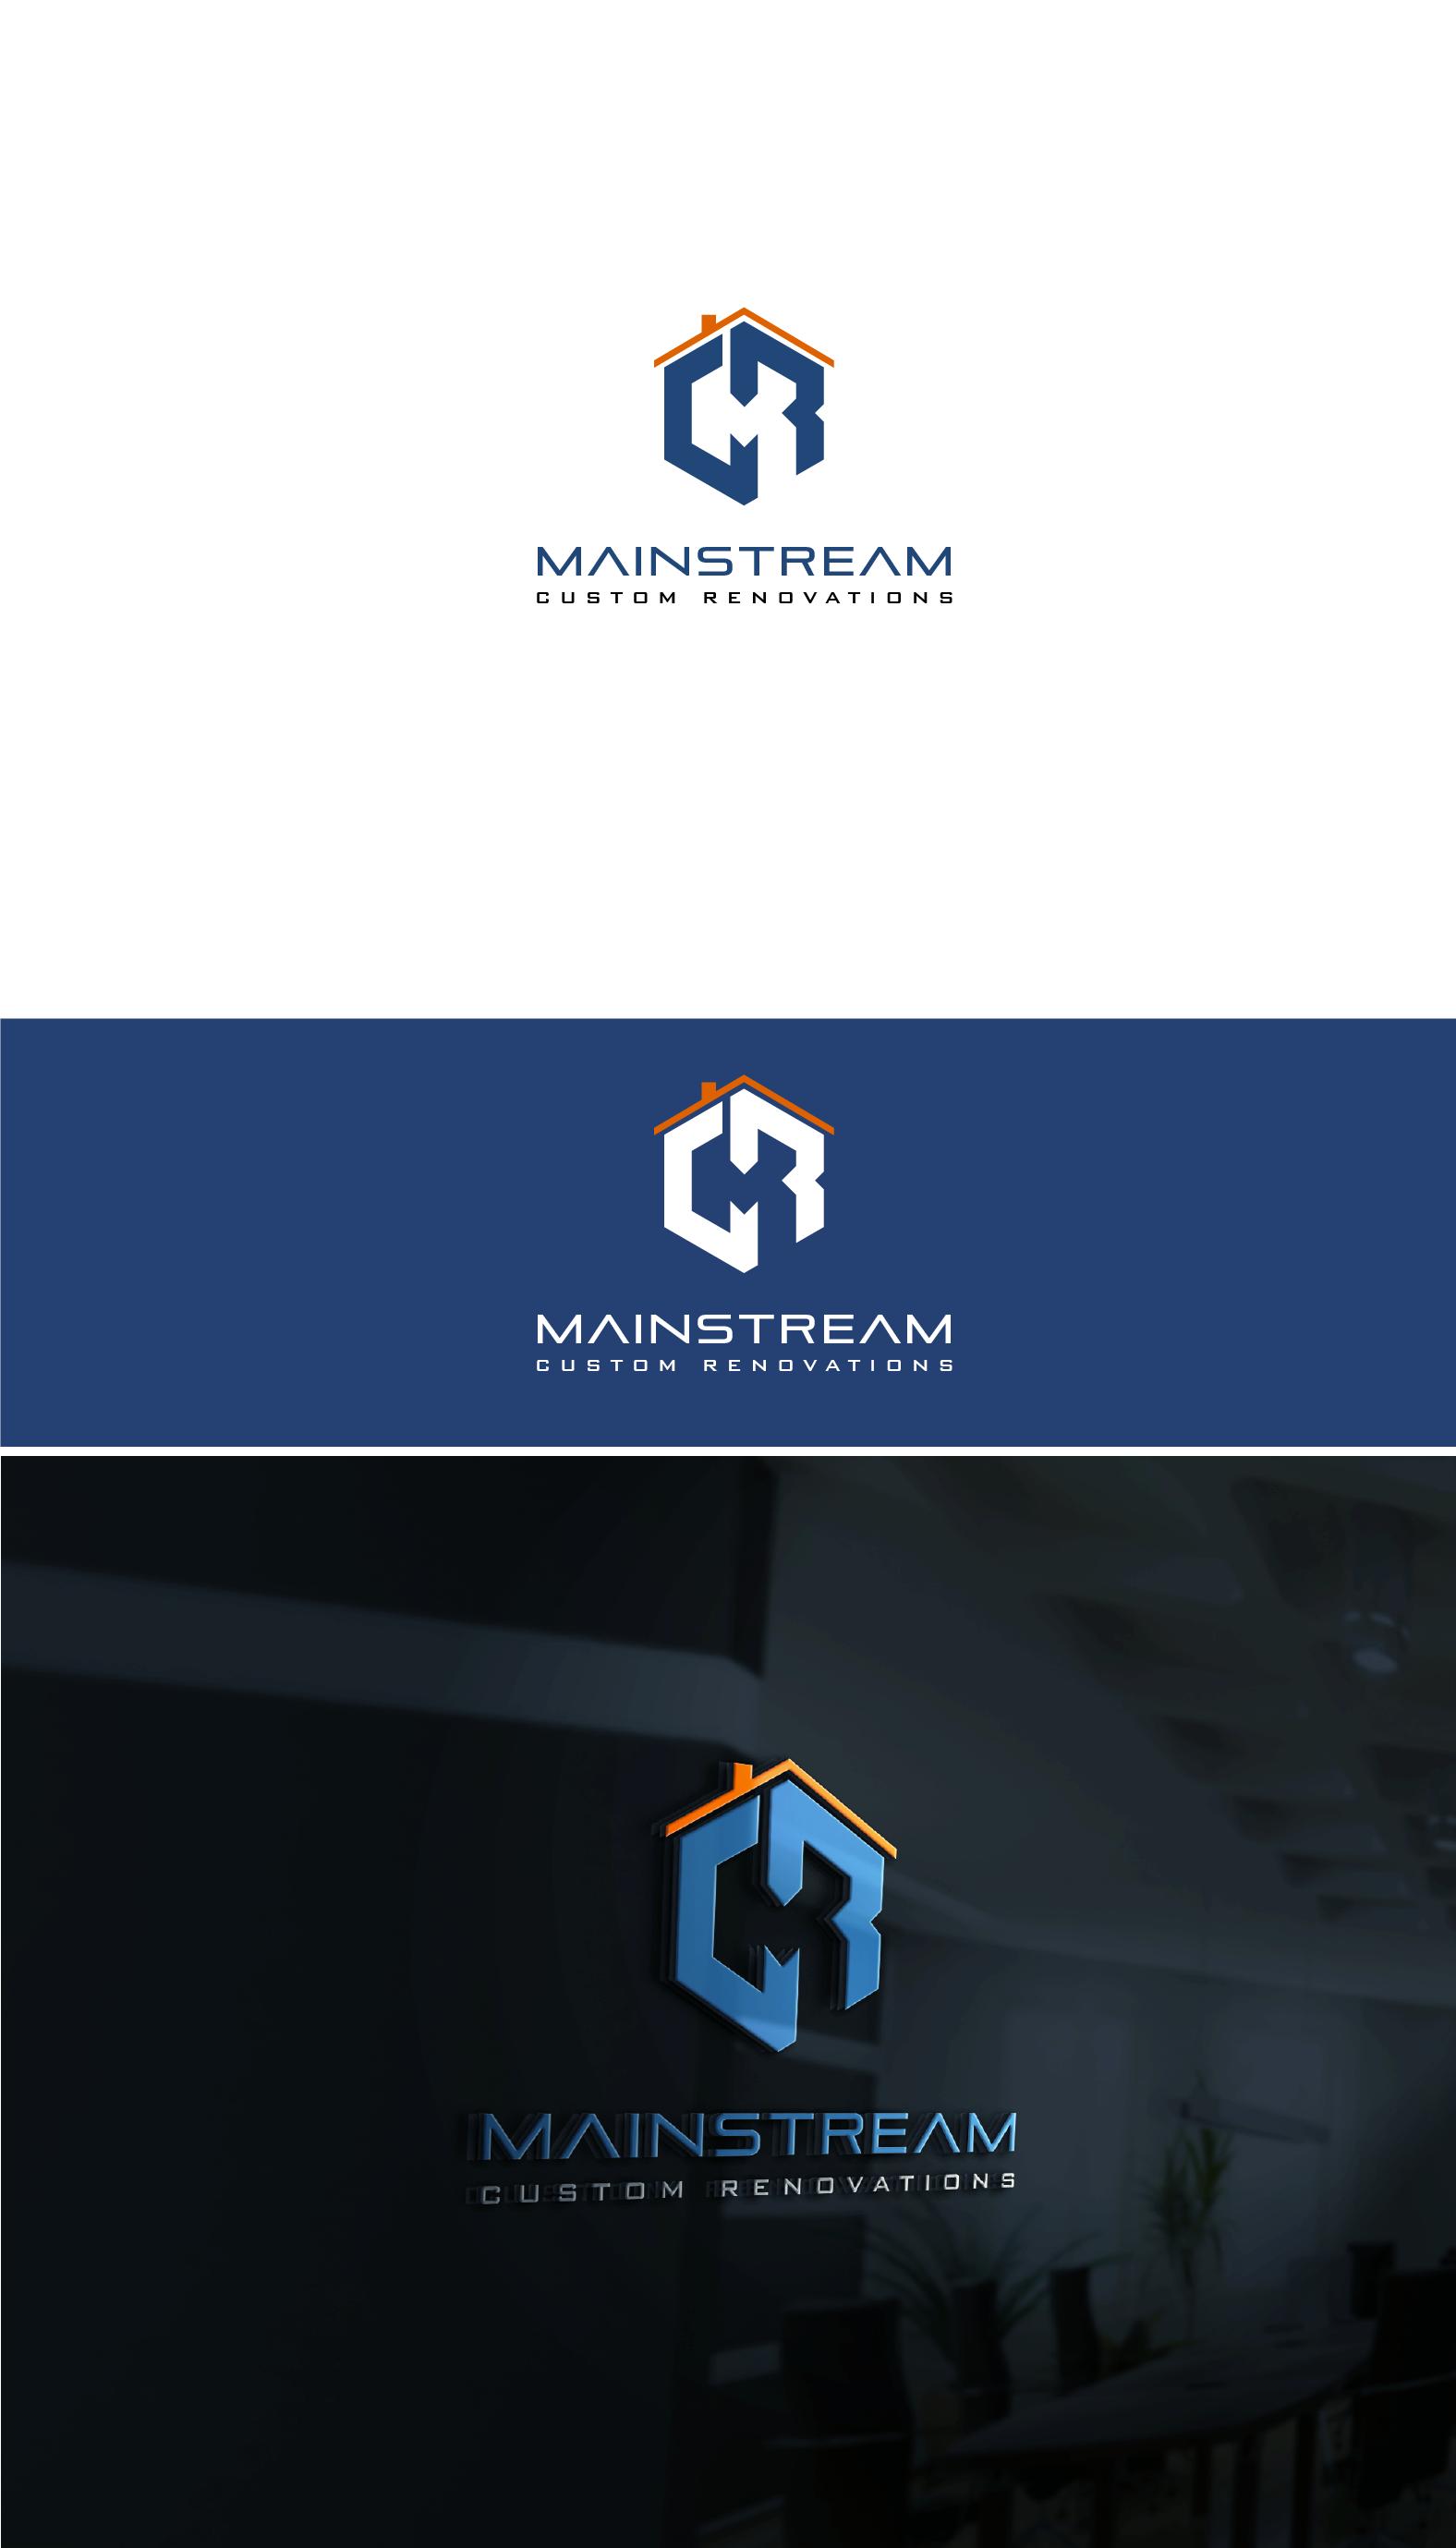 Mainstream 99designs Di 2020